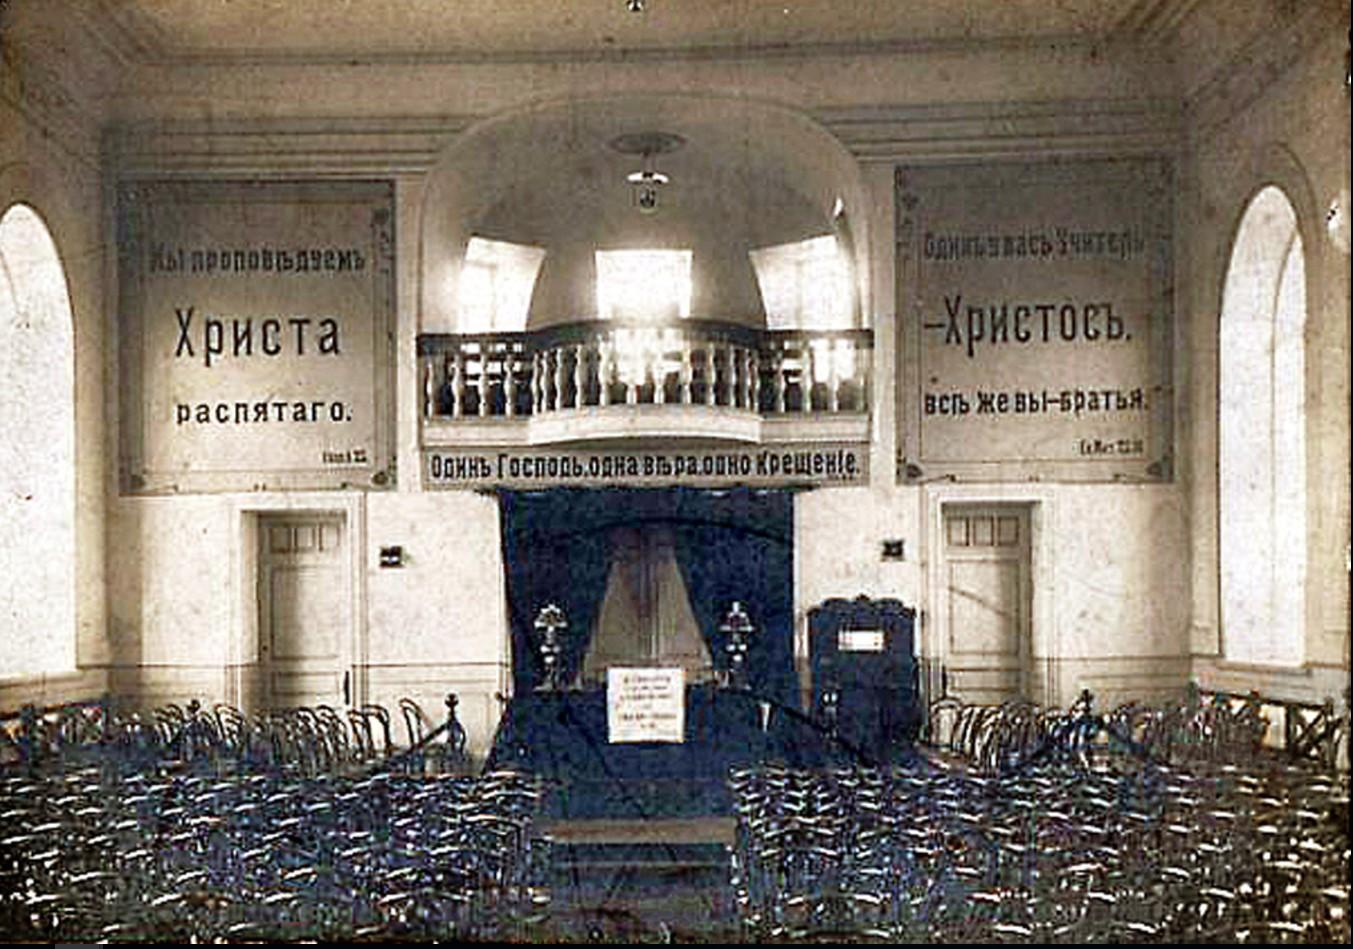 Молитвенный дом баптистов. Интерьер. 1914